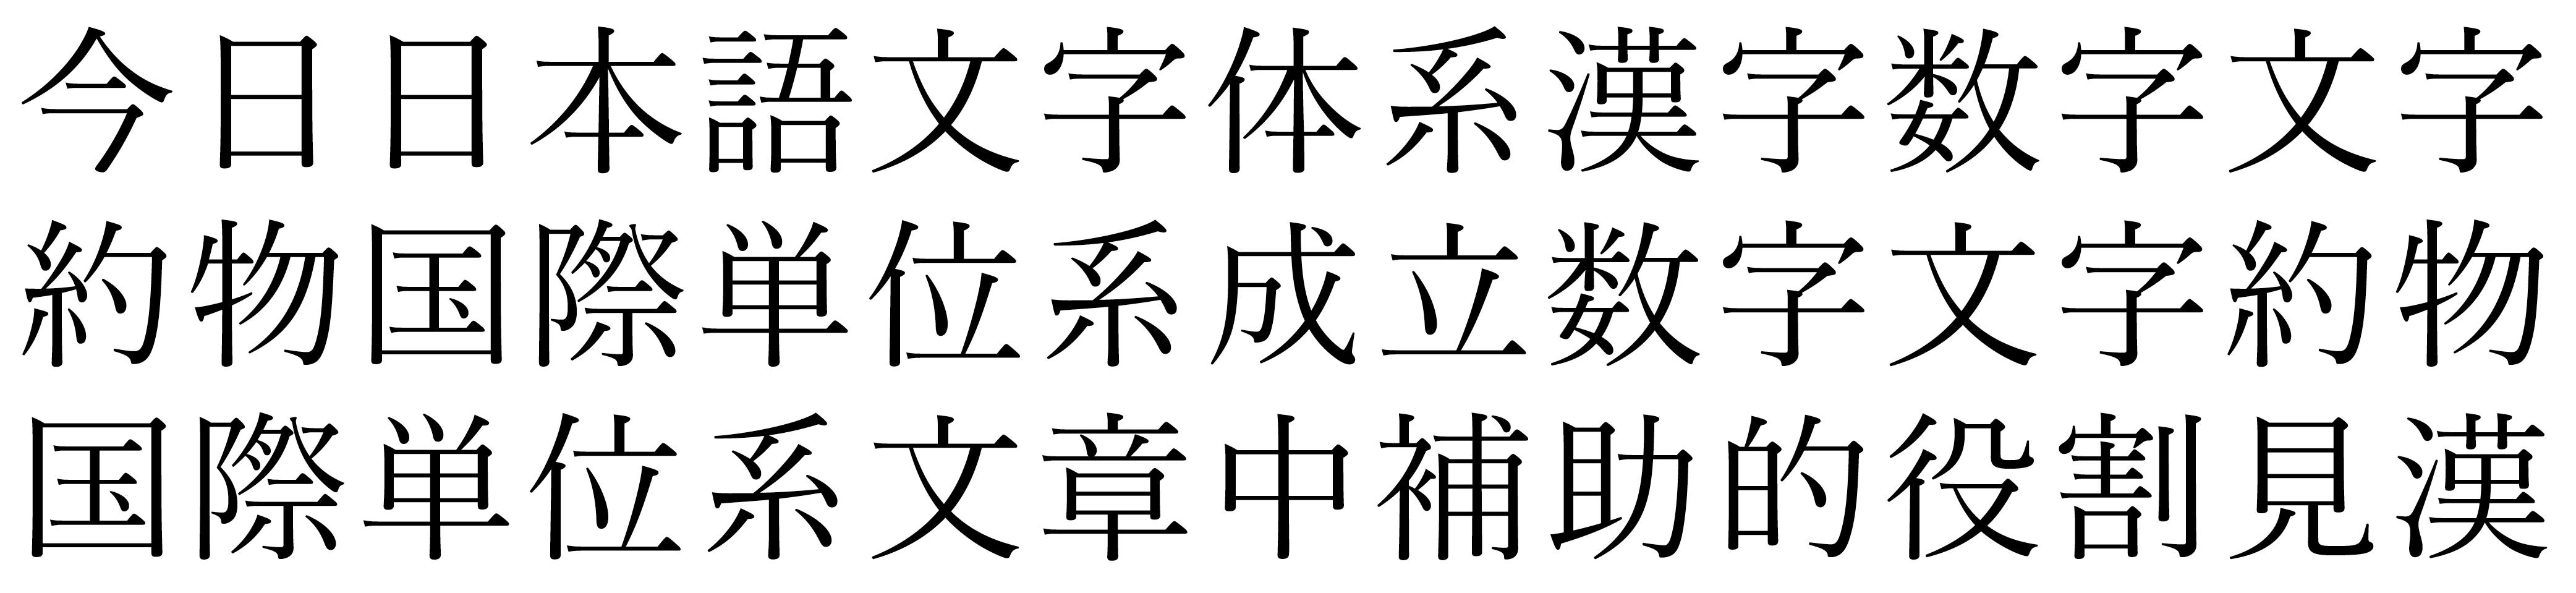 Example of Kanji